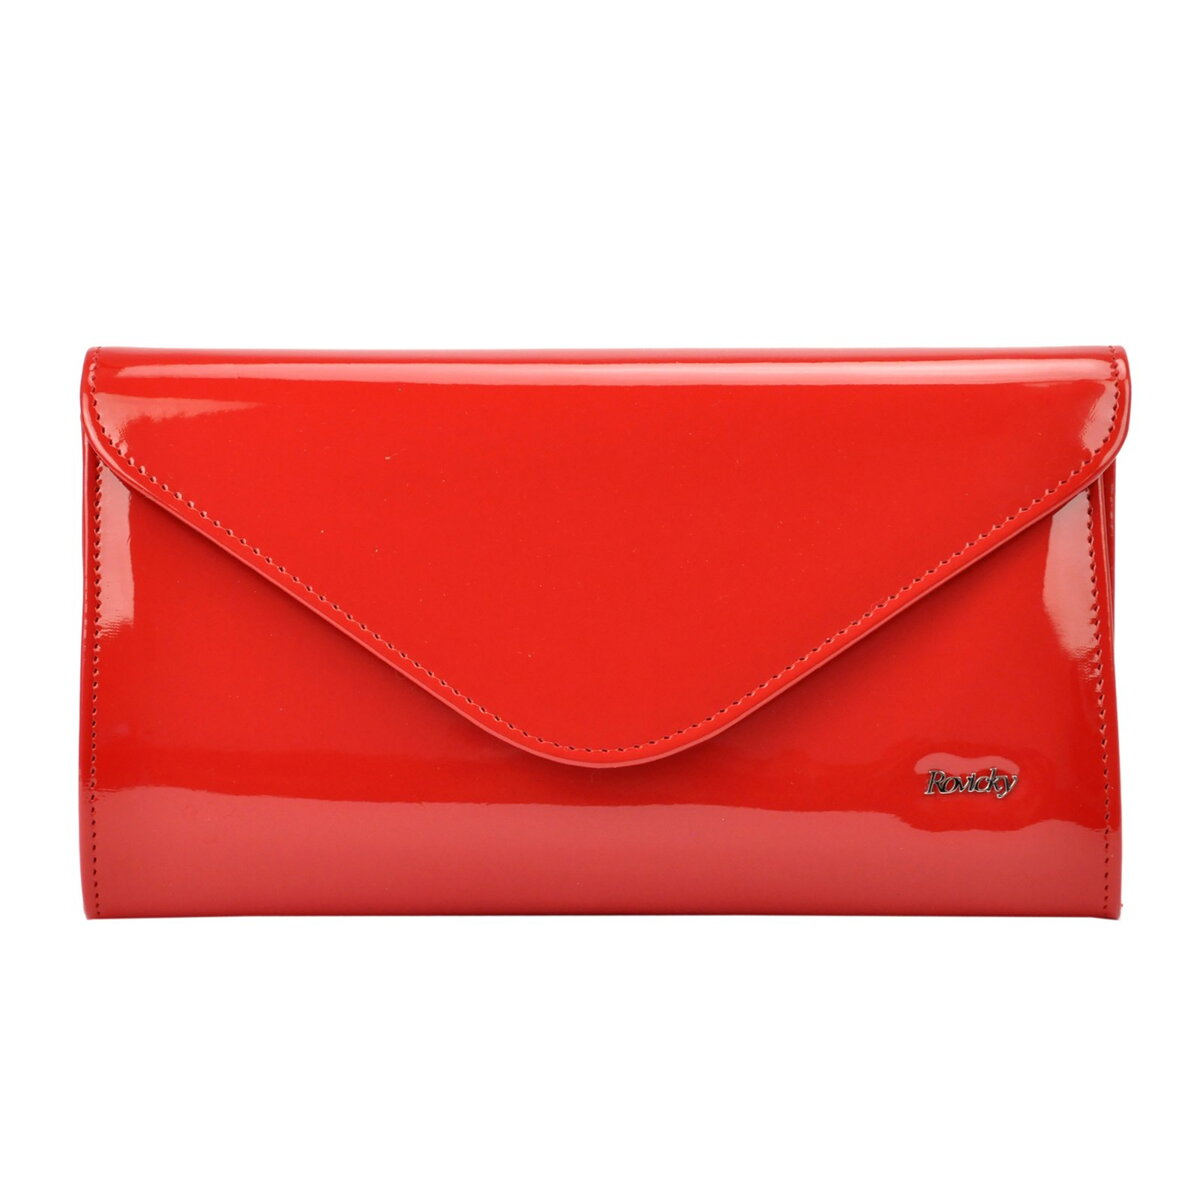 1edfe0e92fd11 ... Červená dámska kabelka do ruky Rovicky W25-L